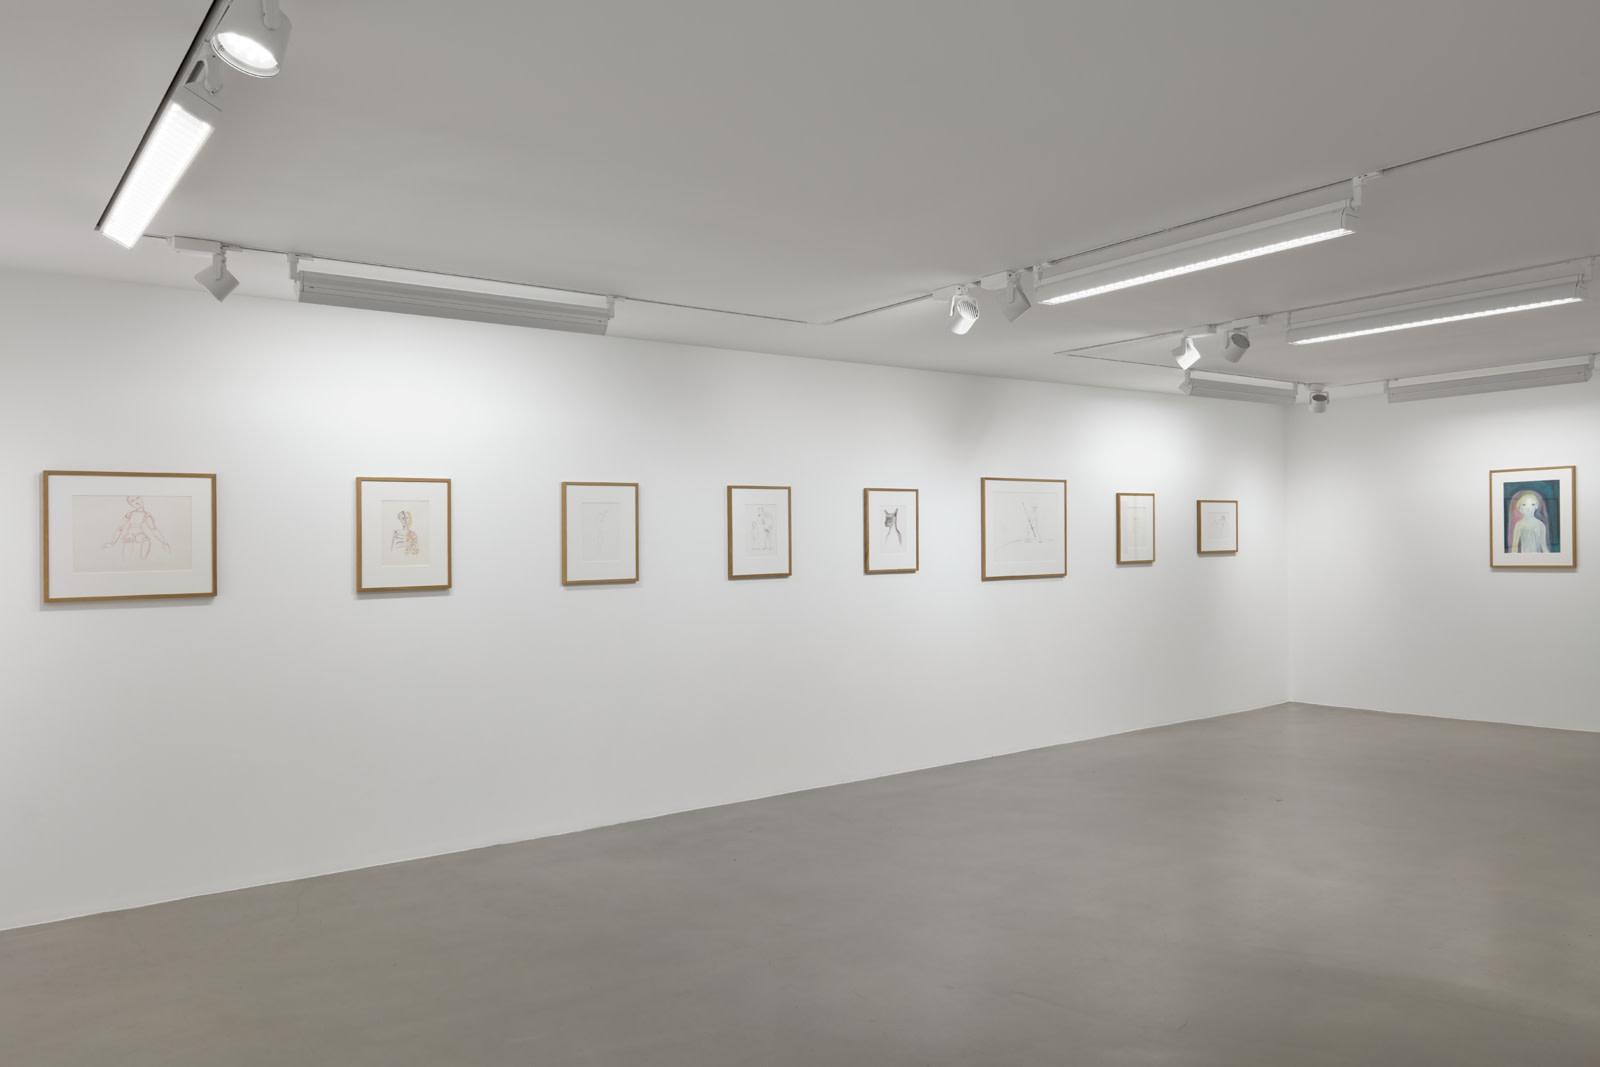 "<div class=""artwork_caption""><p>Installation view, 2018</p><p>Photo by Robert Glowacki</p></div>"